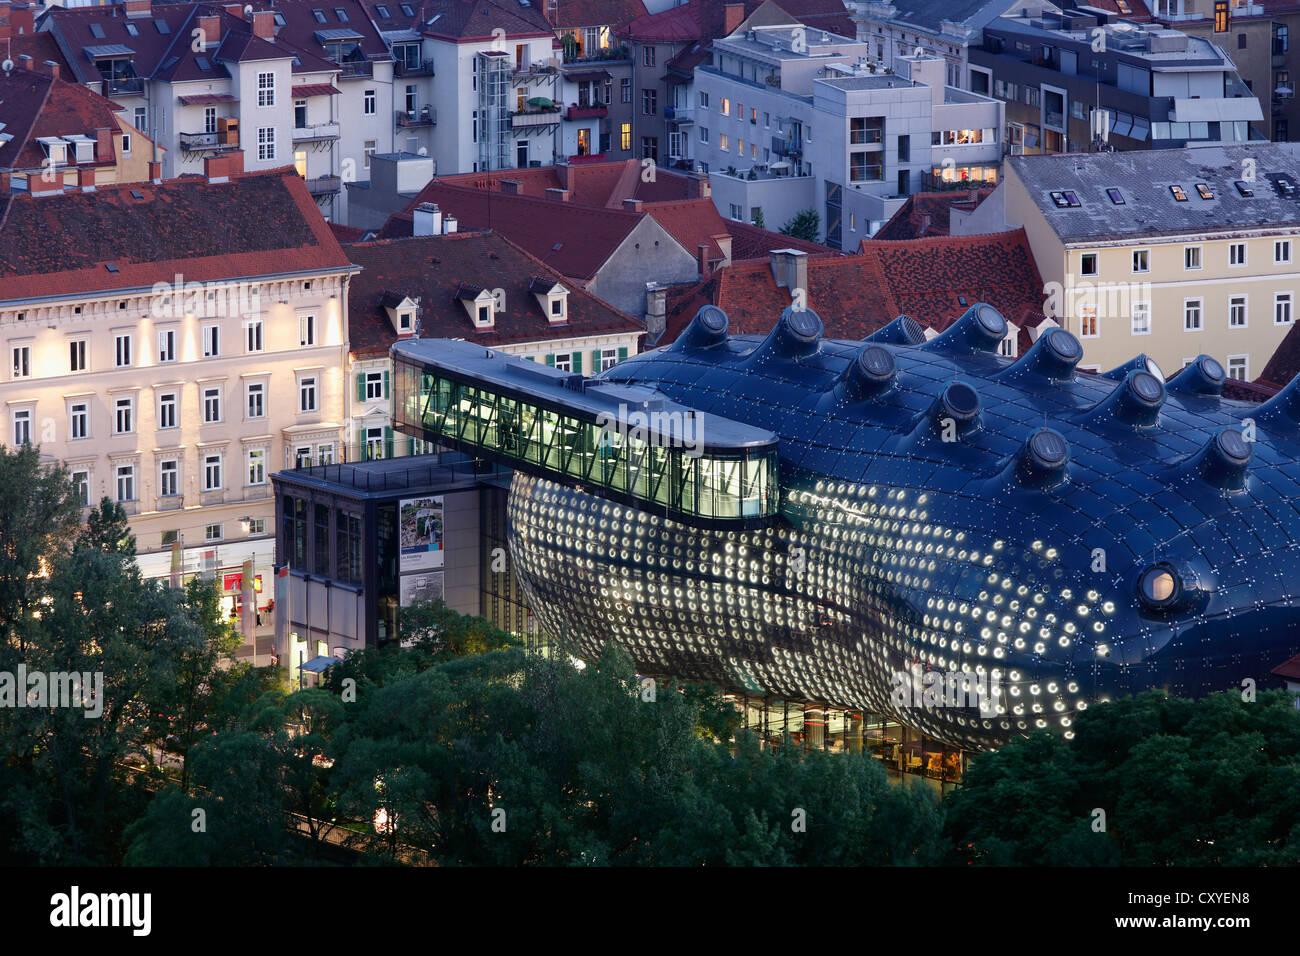 Kunsthaus, art house, view from Schlossberg, castle hill, Graz, Styria, Austria, Europe, PublicGround Stock Photo